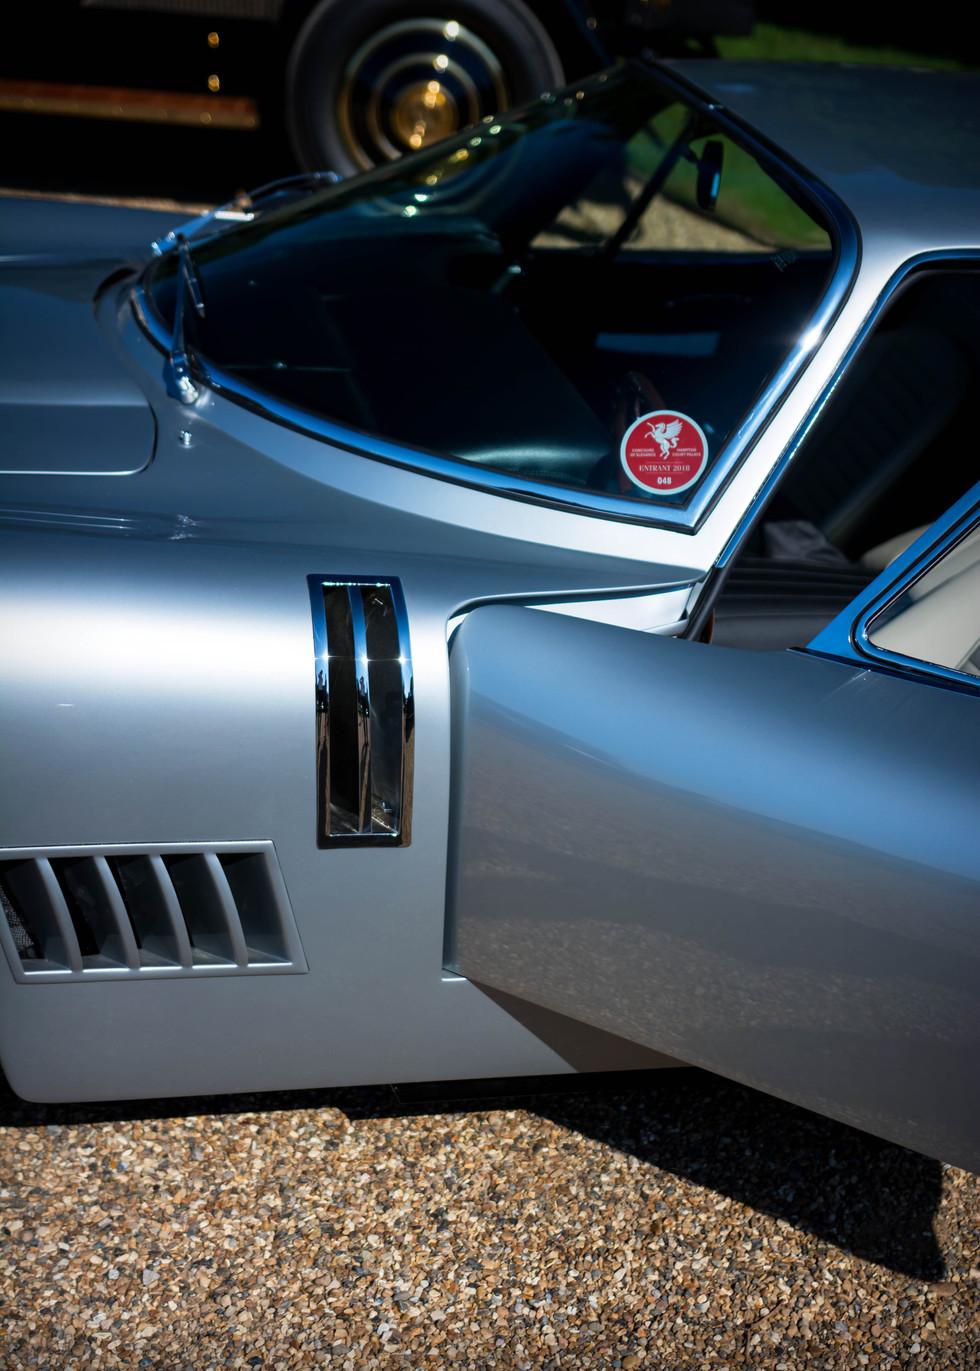 Guy Berryman's 1967 Bizzarrini 5300 GT